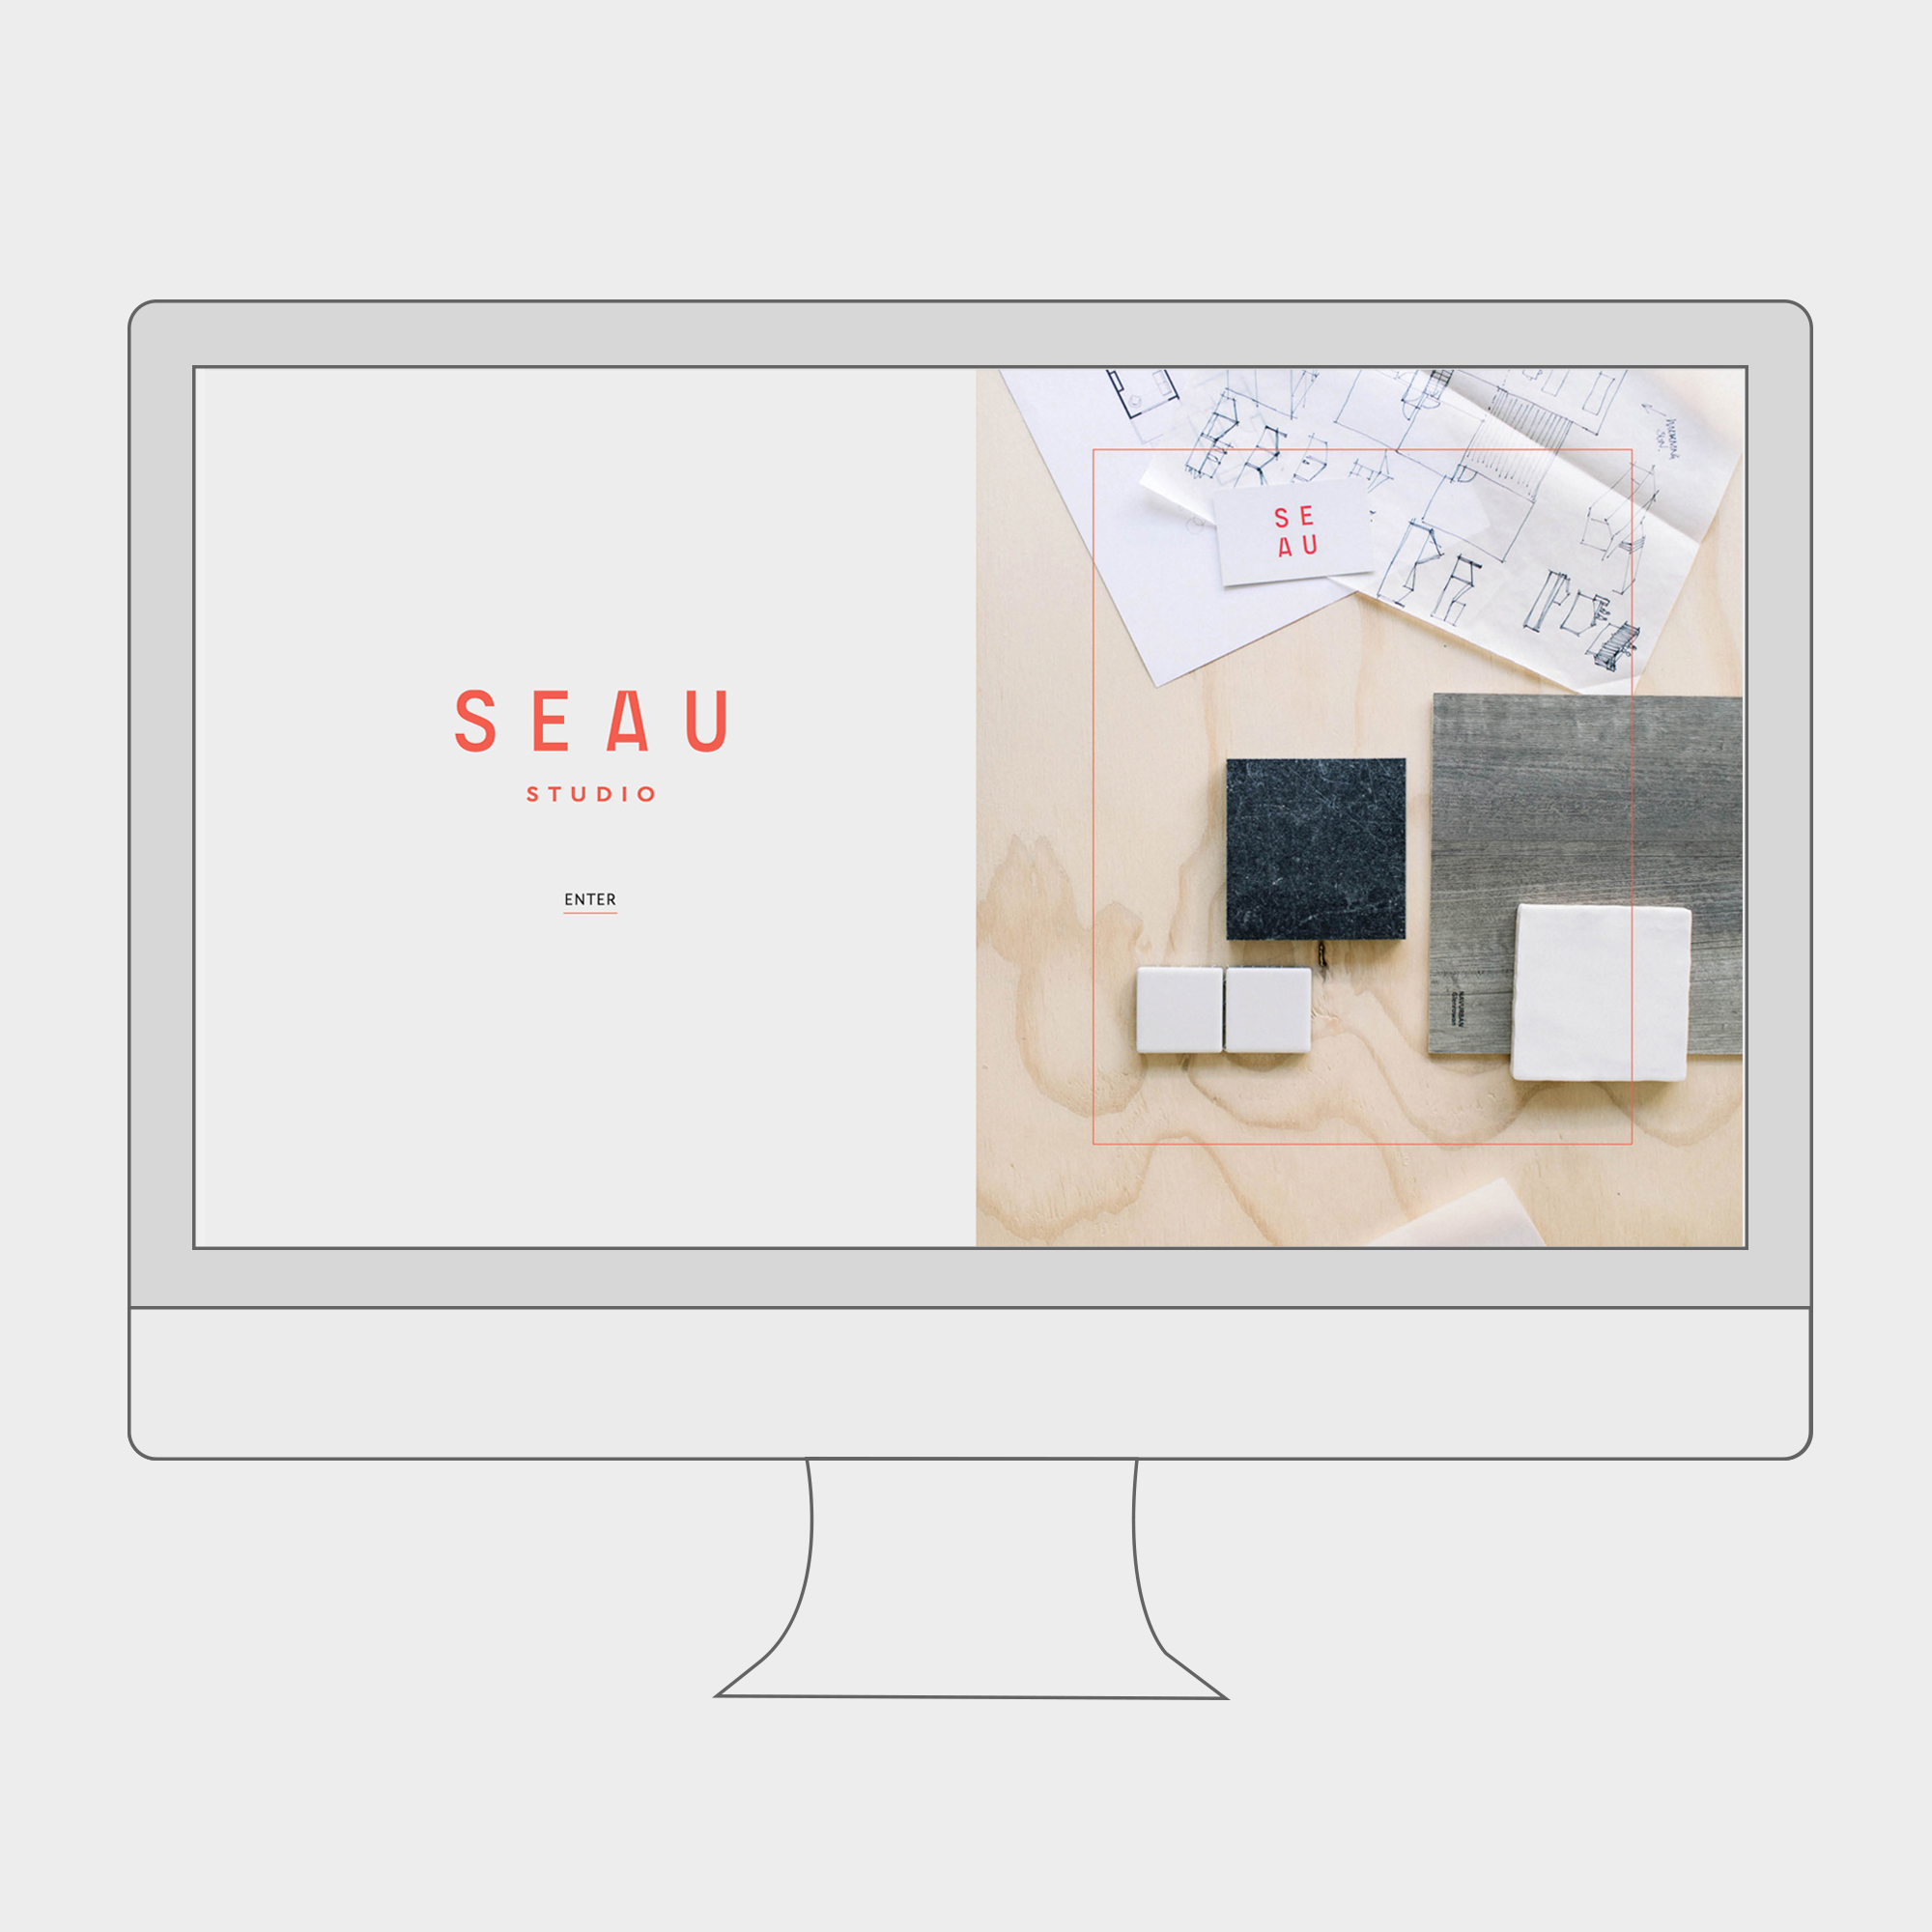 Seau1_story copy.jpg